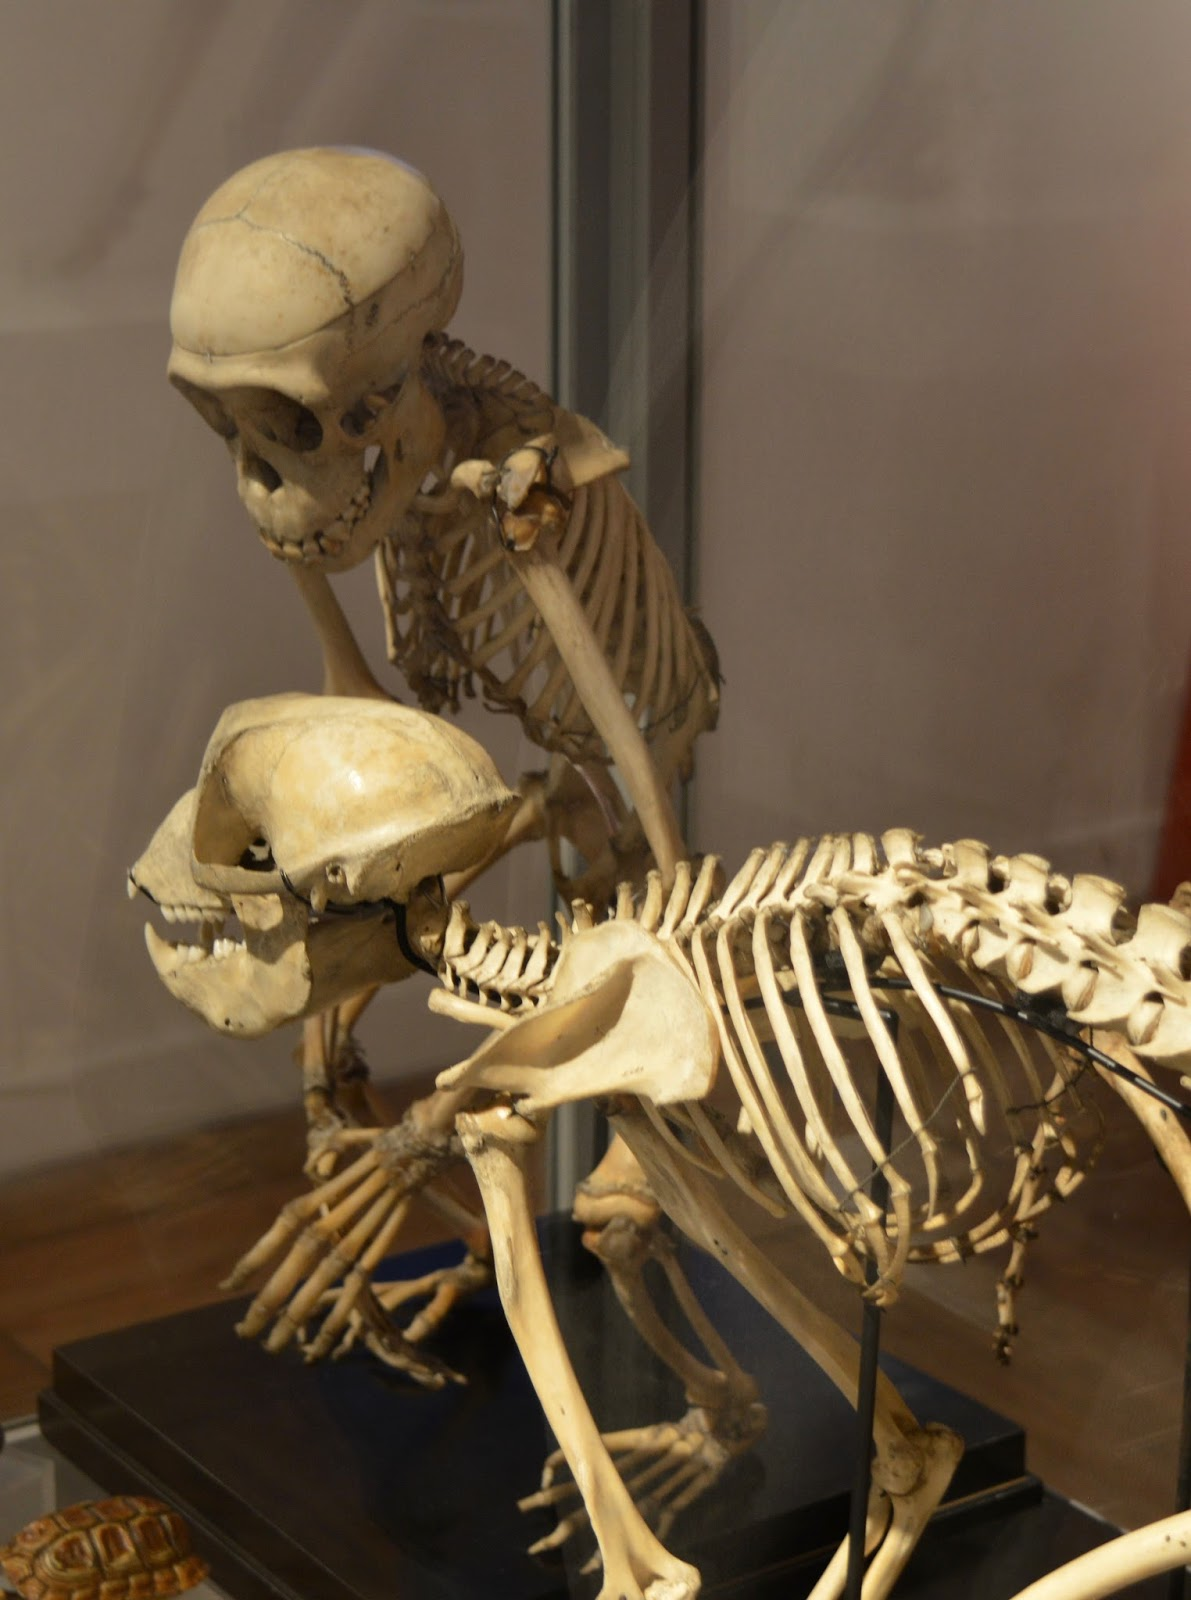 Bones Exhibition at Hancock Museum, Newcastle - monkey skeletons